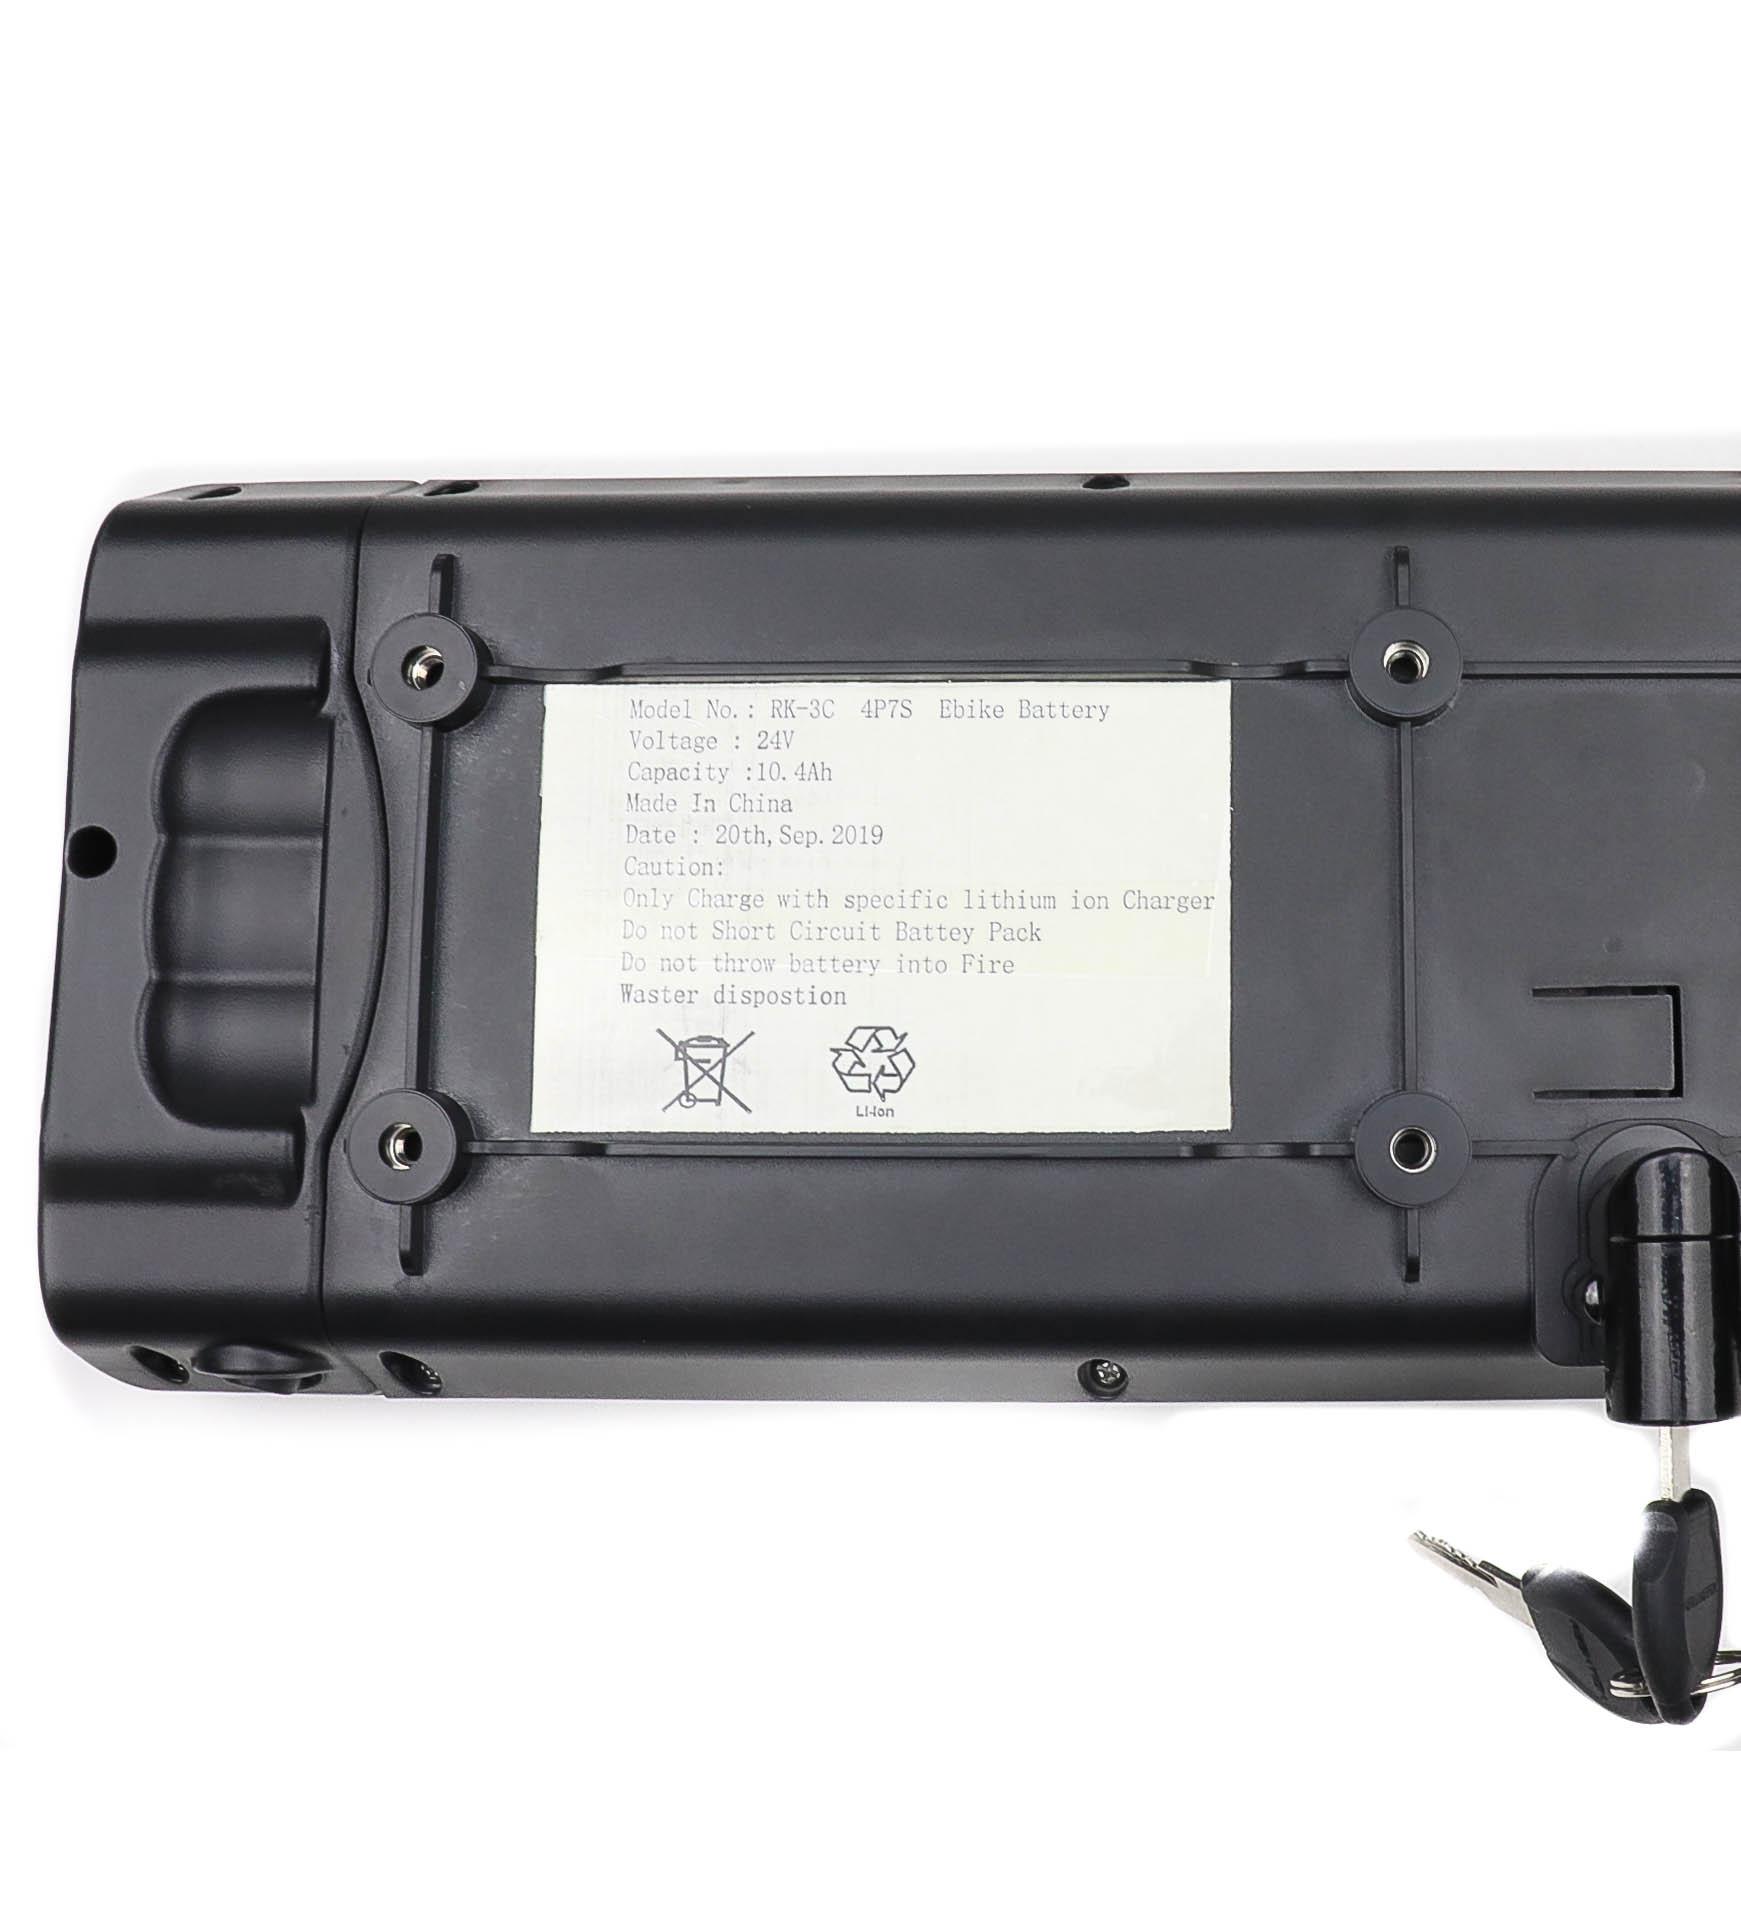 4P7S 24V 10.4Ah Lithium-ion Ebike Battery